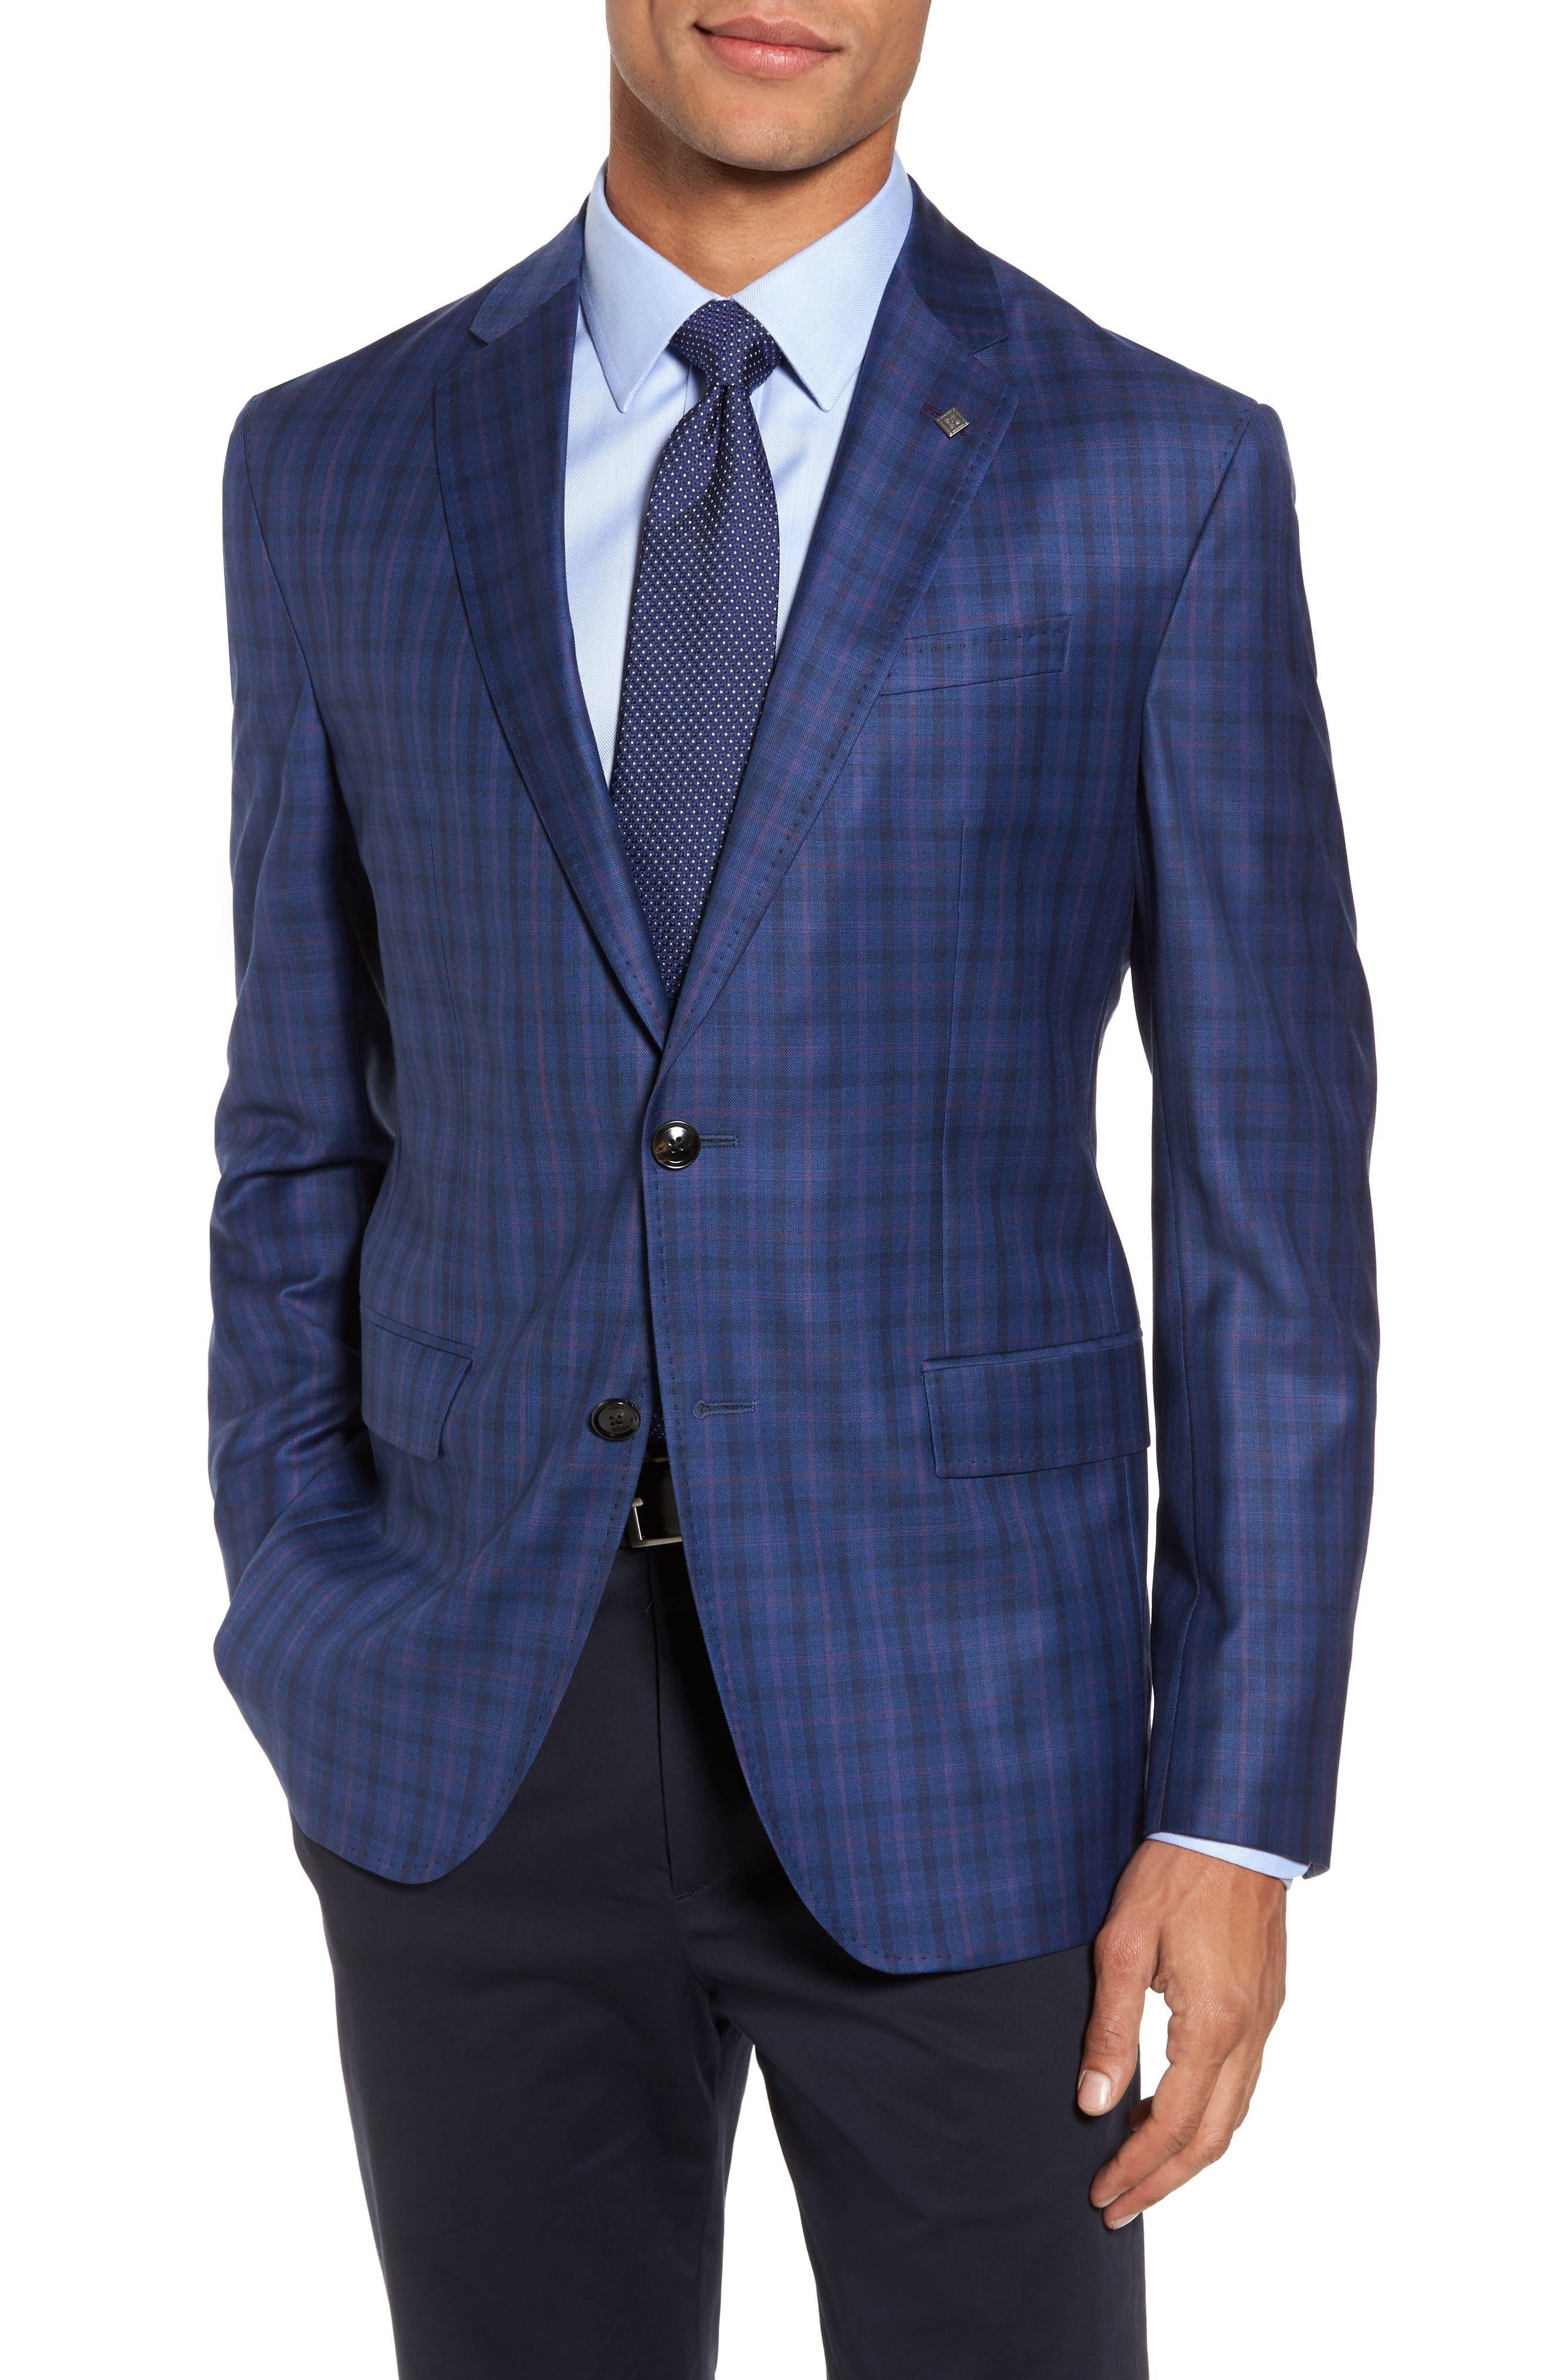 Konan Trim Fit Plaid Wool Sport Coat,                             Main thumbnail 1, color,                             400